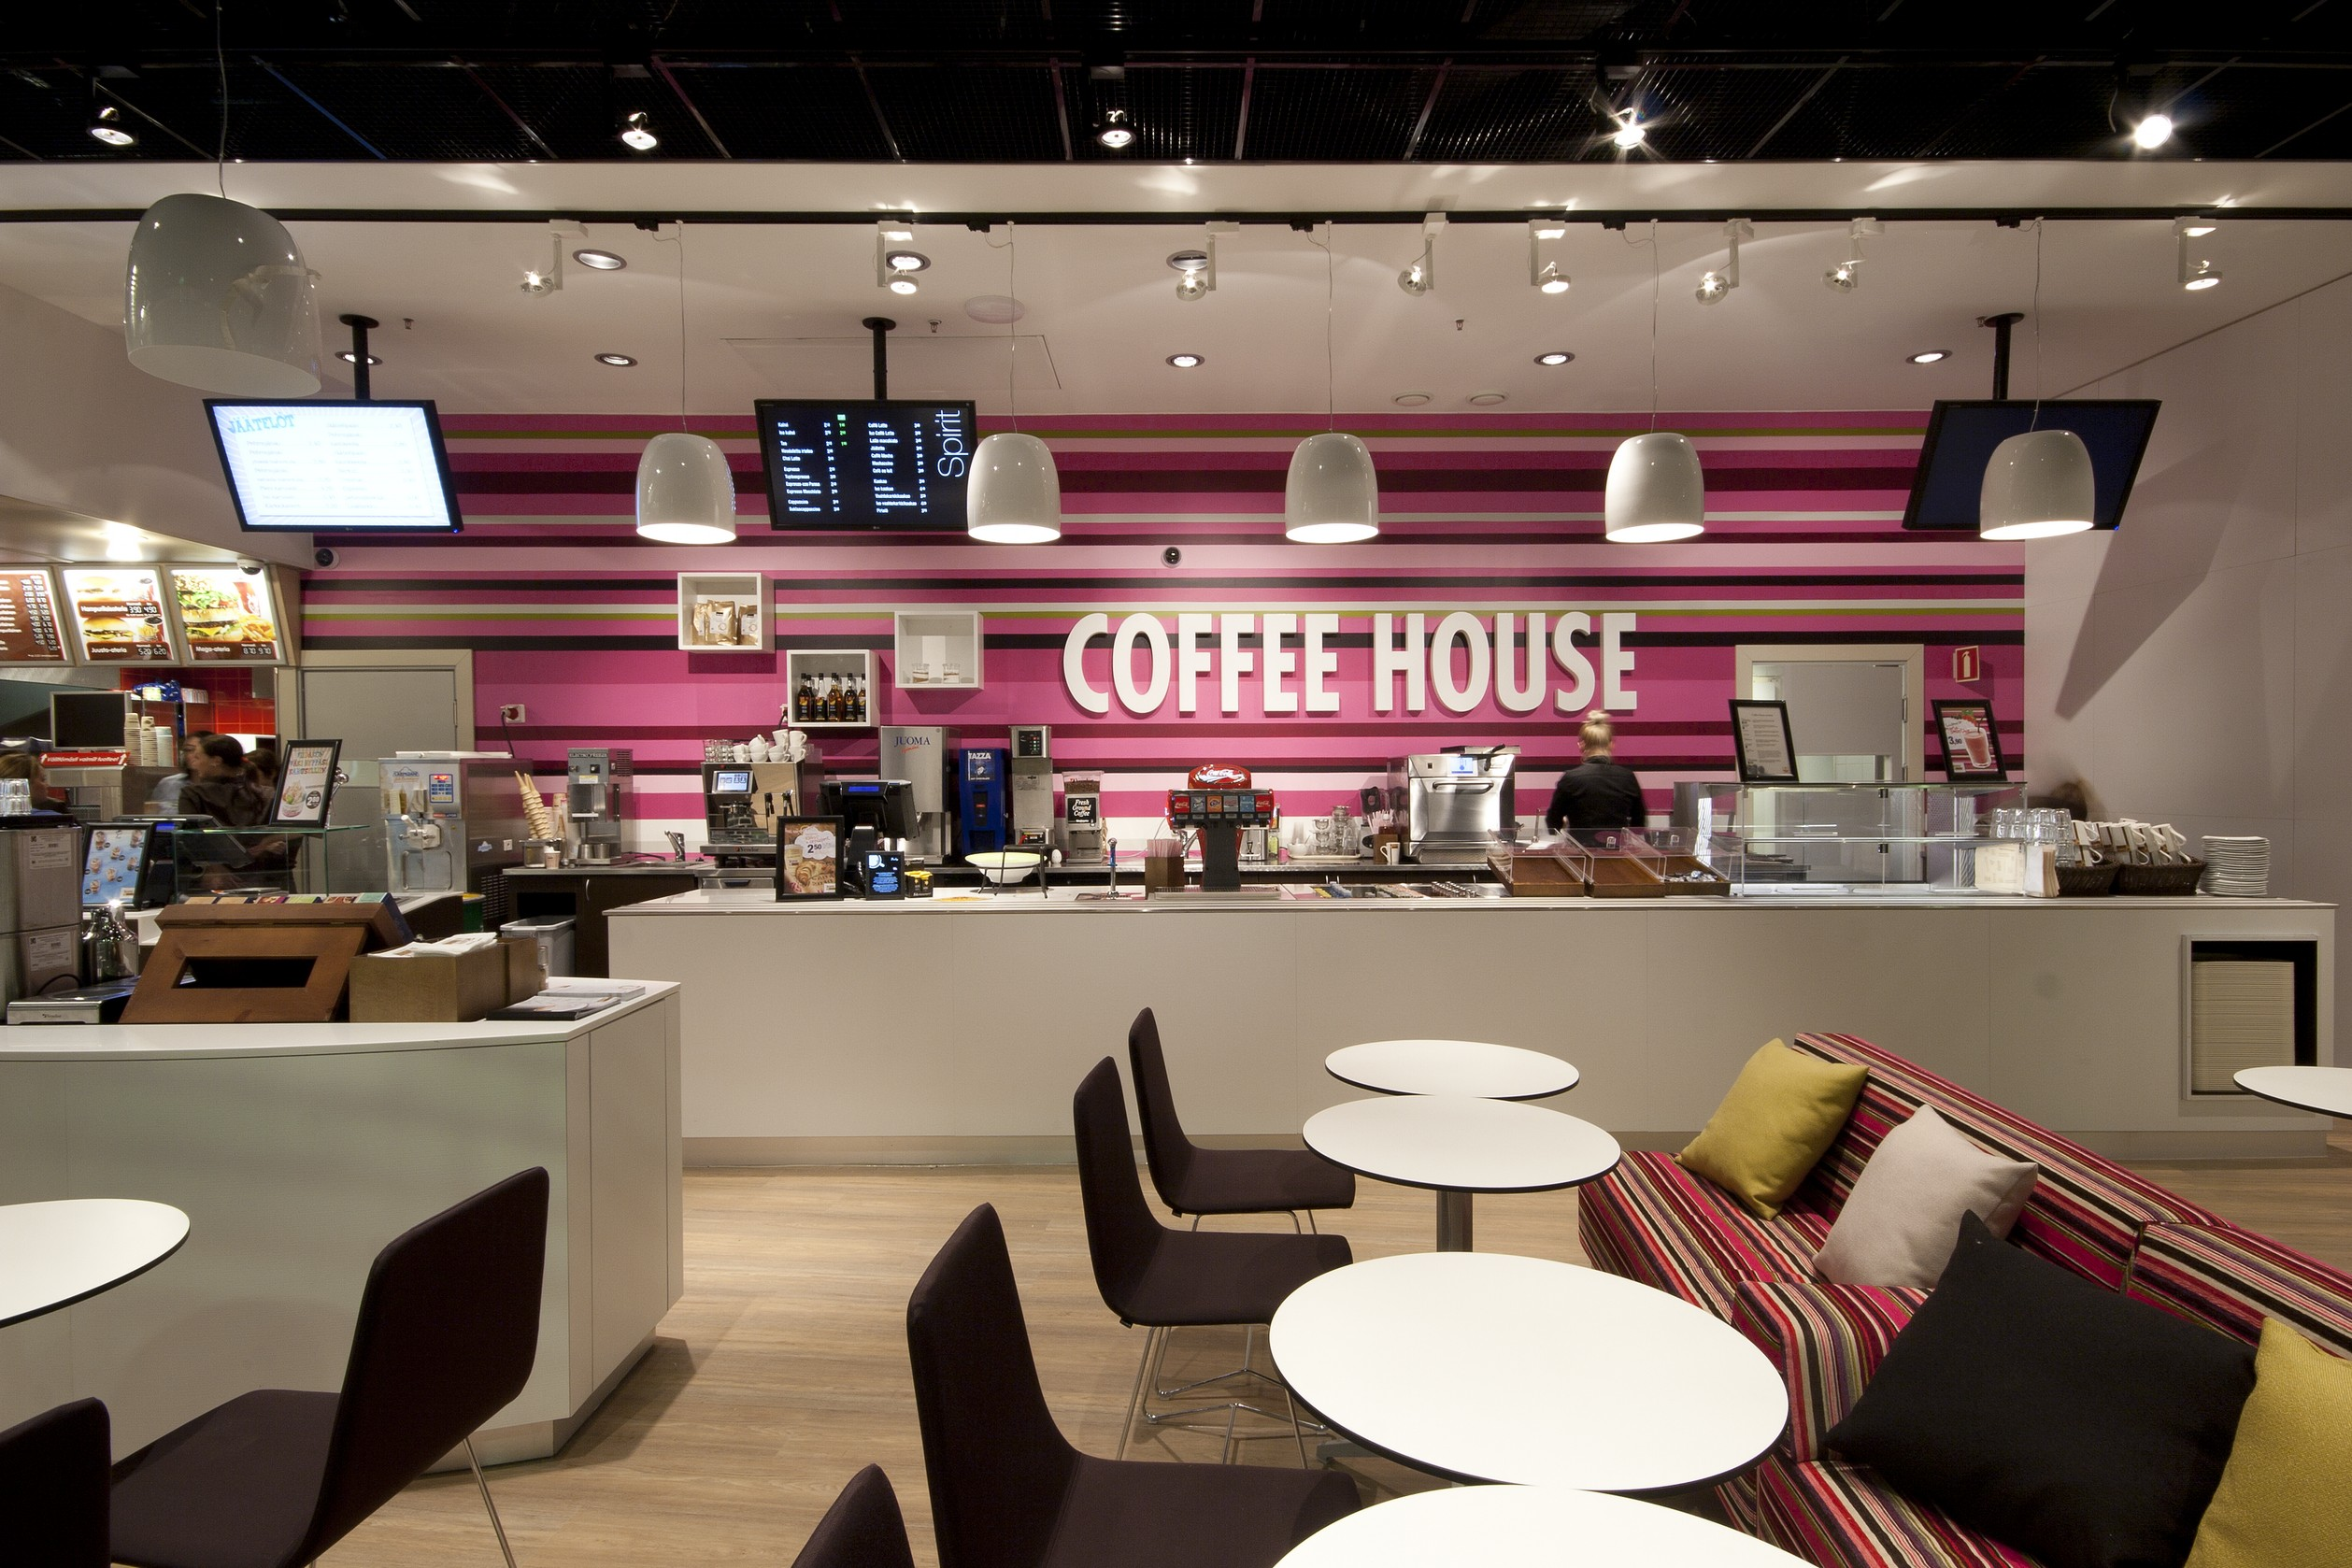 coffee house chain amerikka design practice ltd archello rh archello com coffee house design trend coffee house design clipart